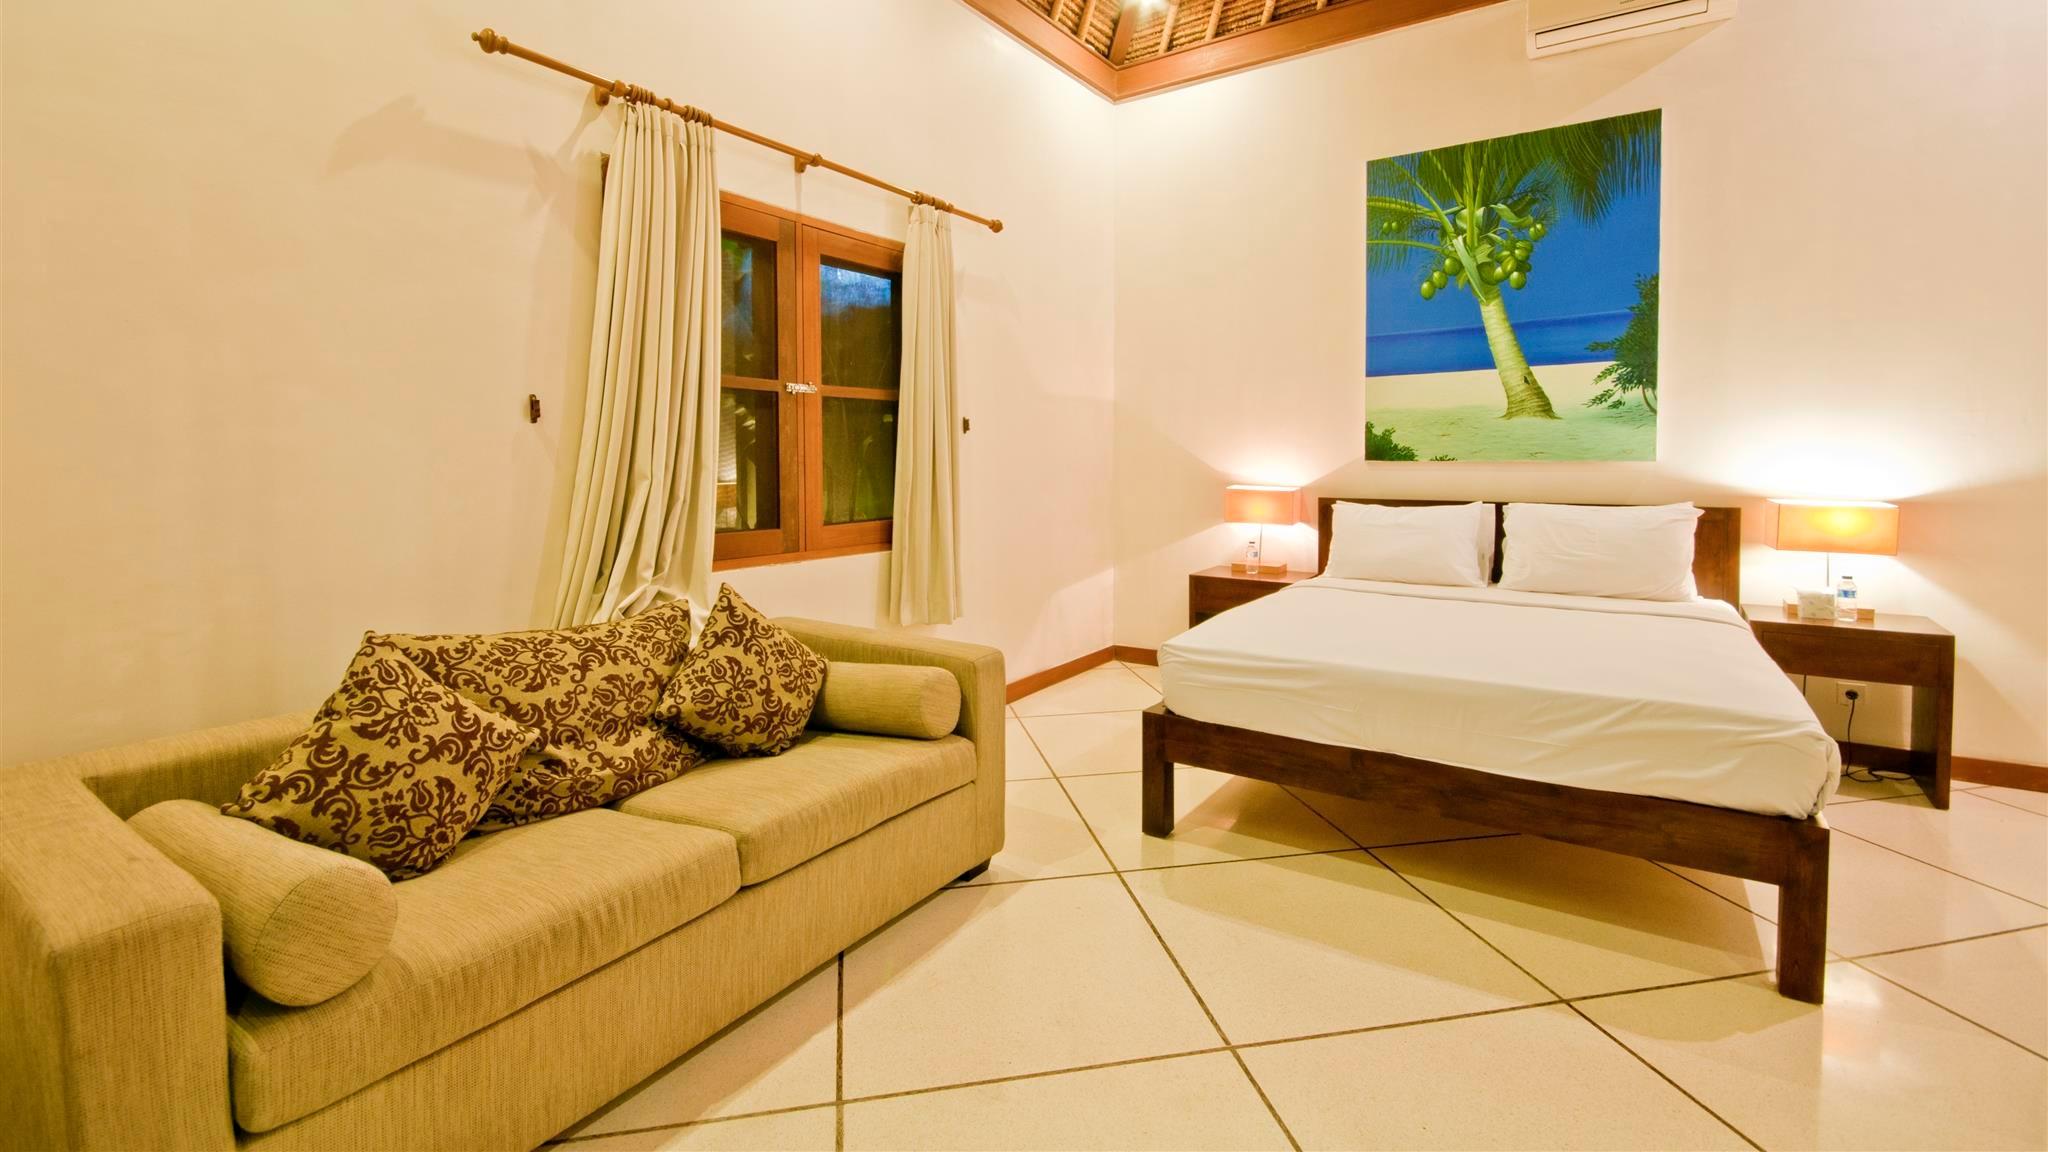 Bedroom with Sofa - Villa Darma - Seminyak, Bali